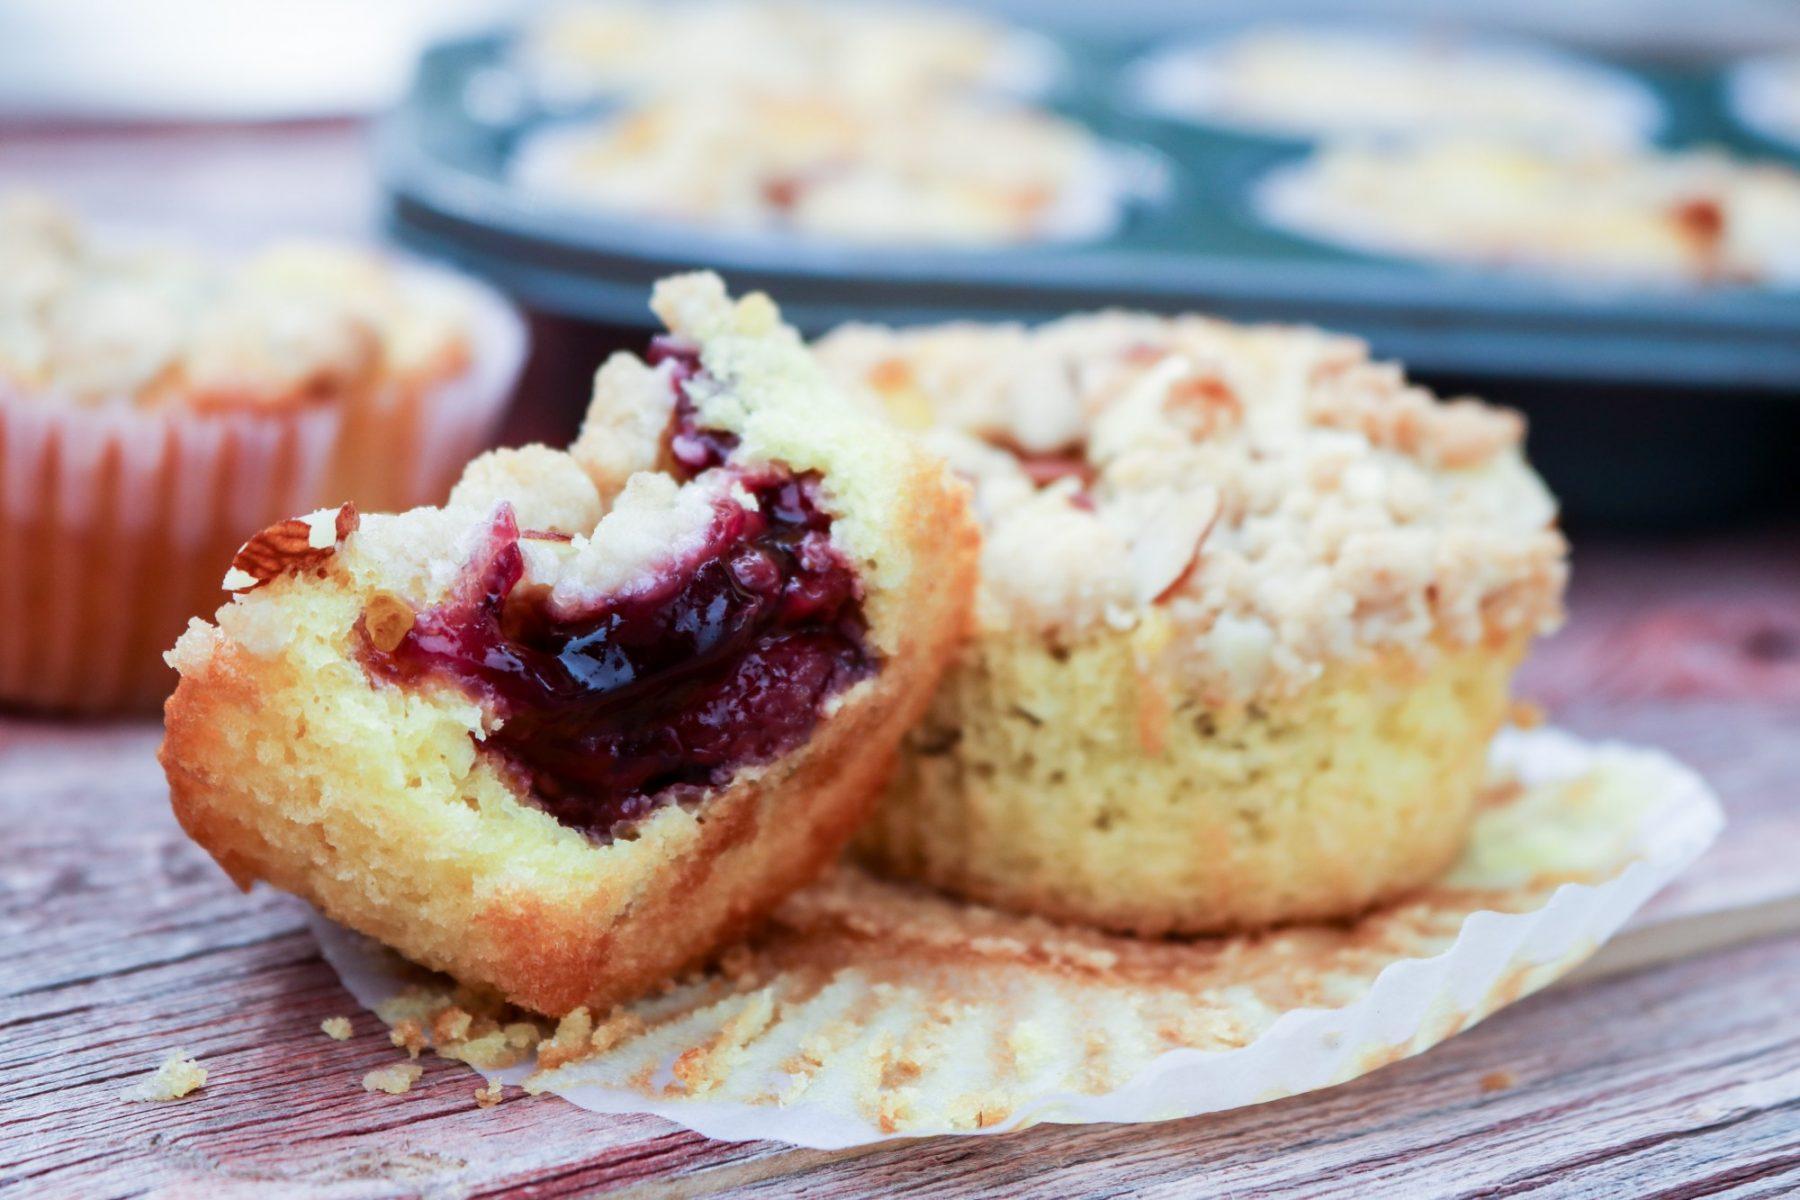 A close-up of Lemon Raspberry Cobbler Cupcakes